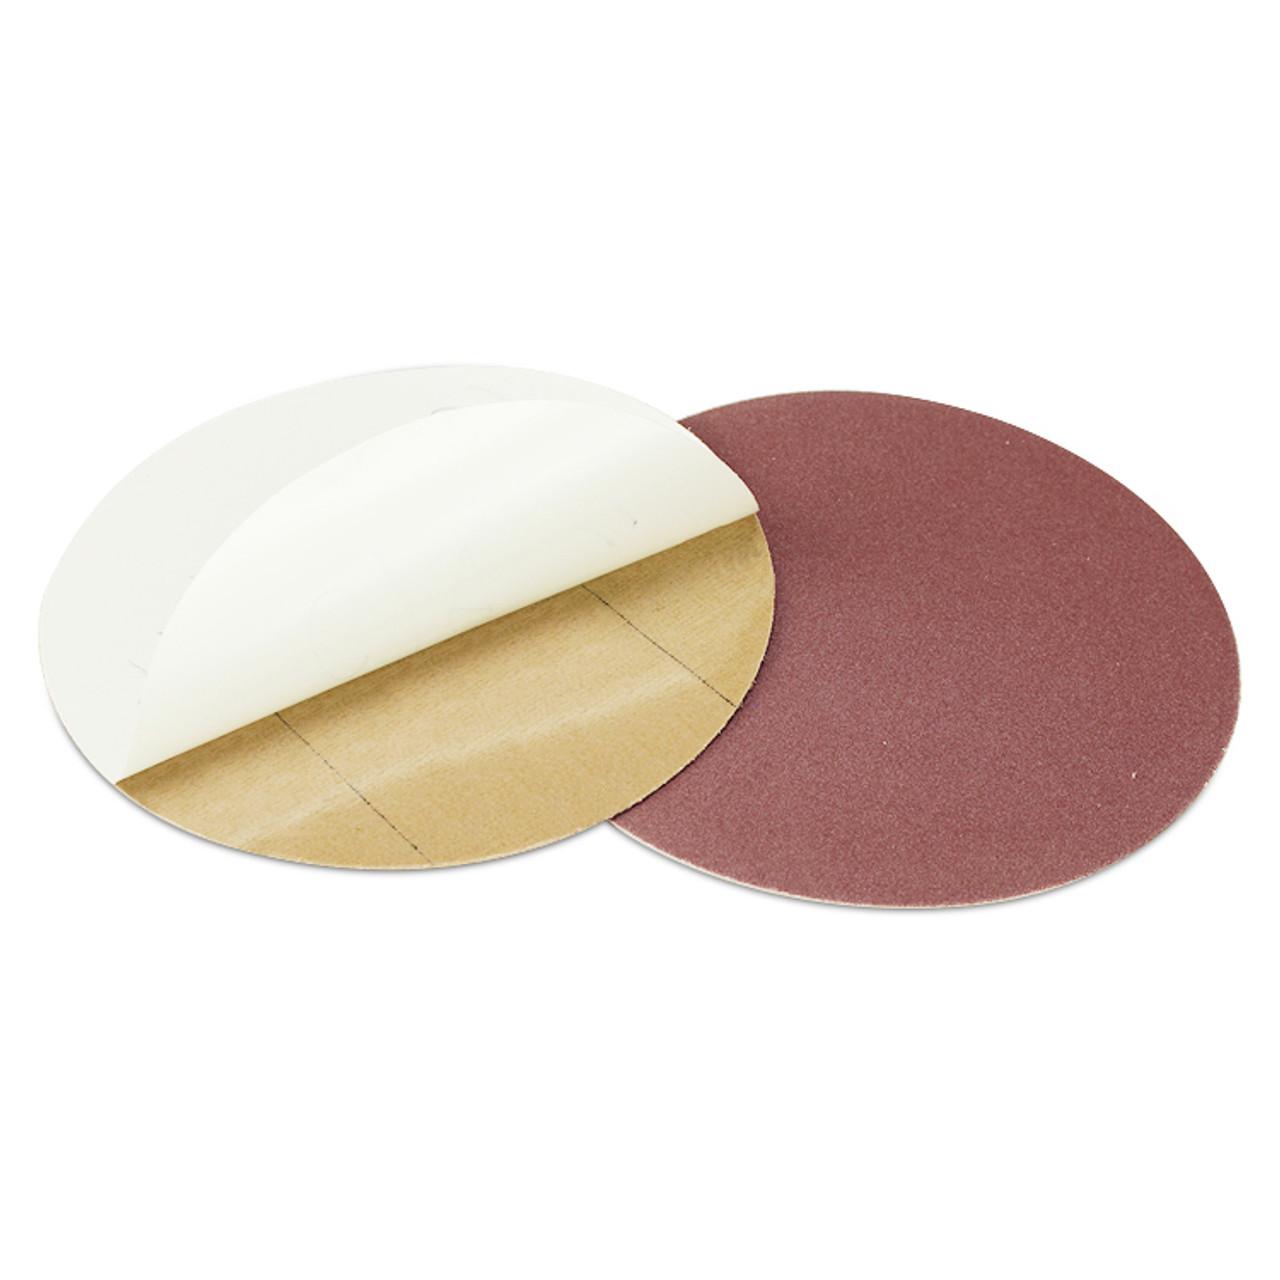 100 grit 9 inch PSA sanding disc